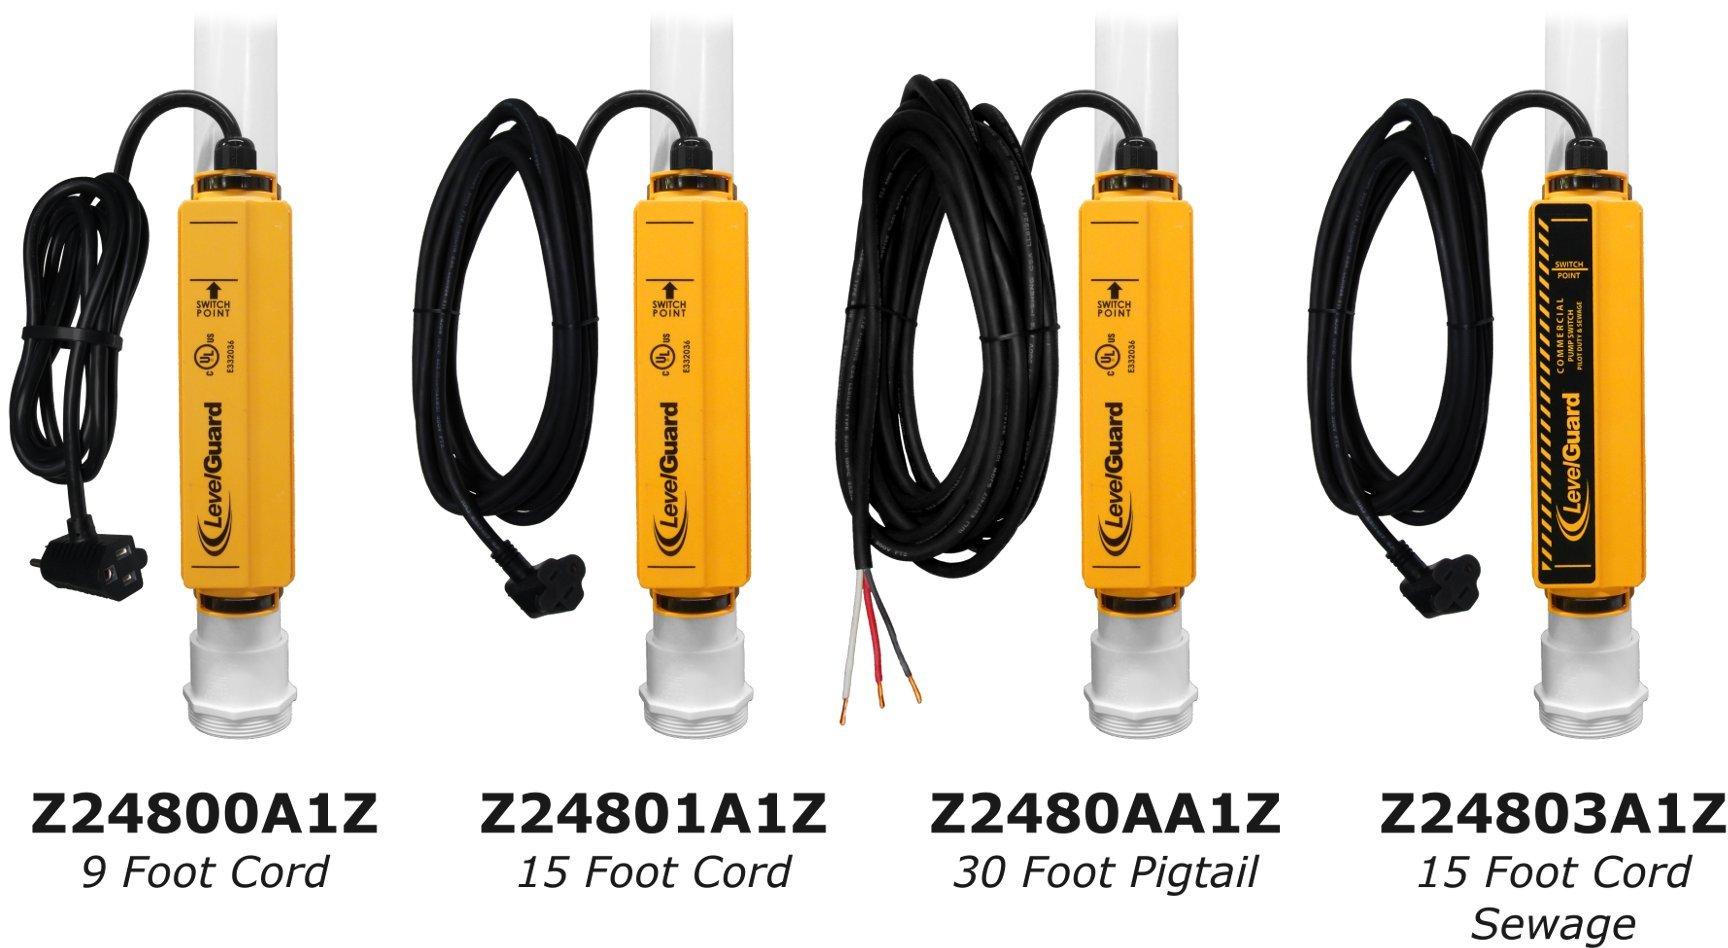 LevelGuard Z24803PTZ Solid State Sewage Pump Switch